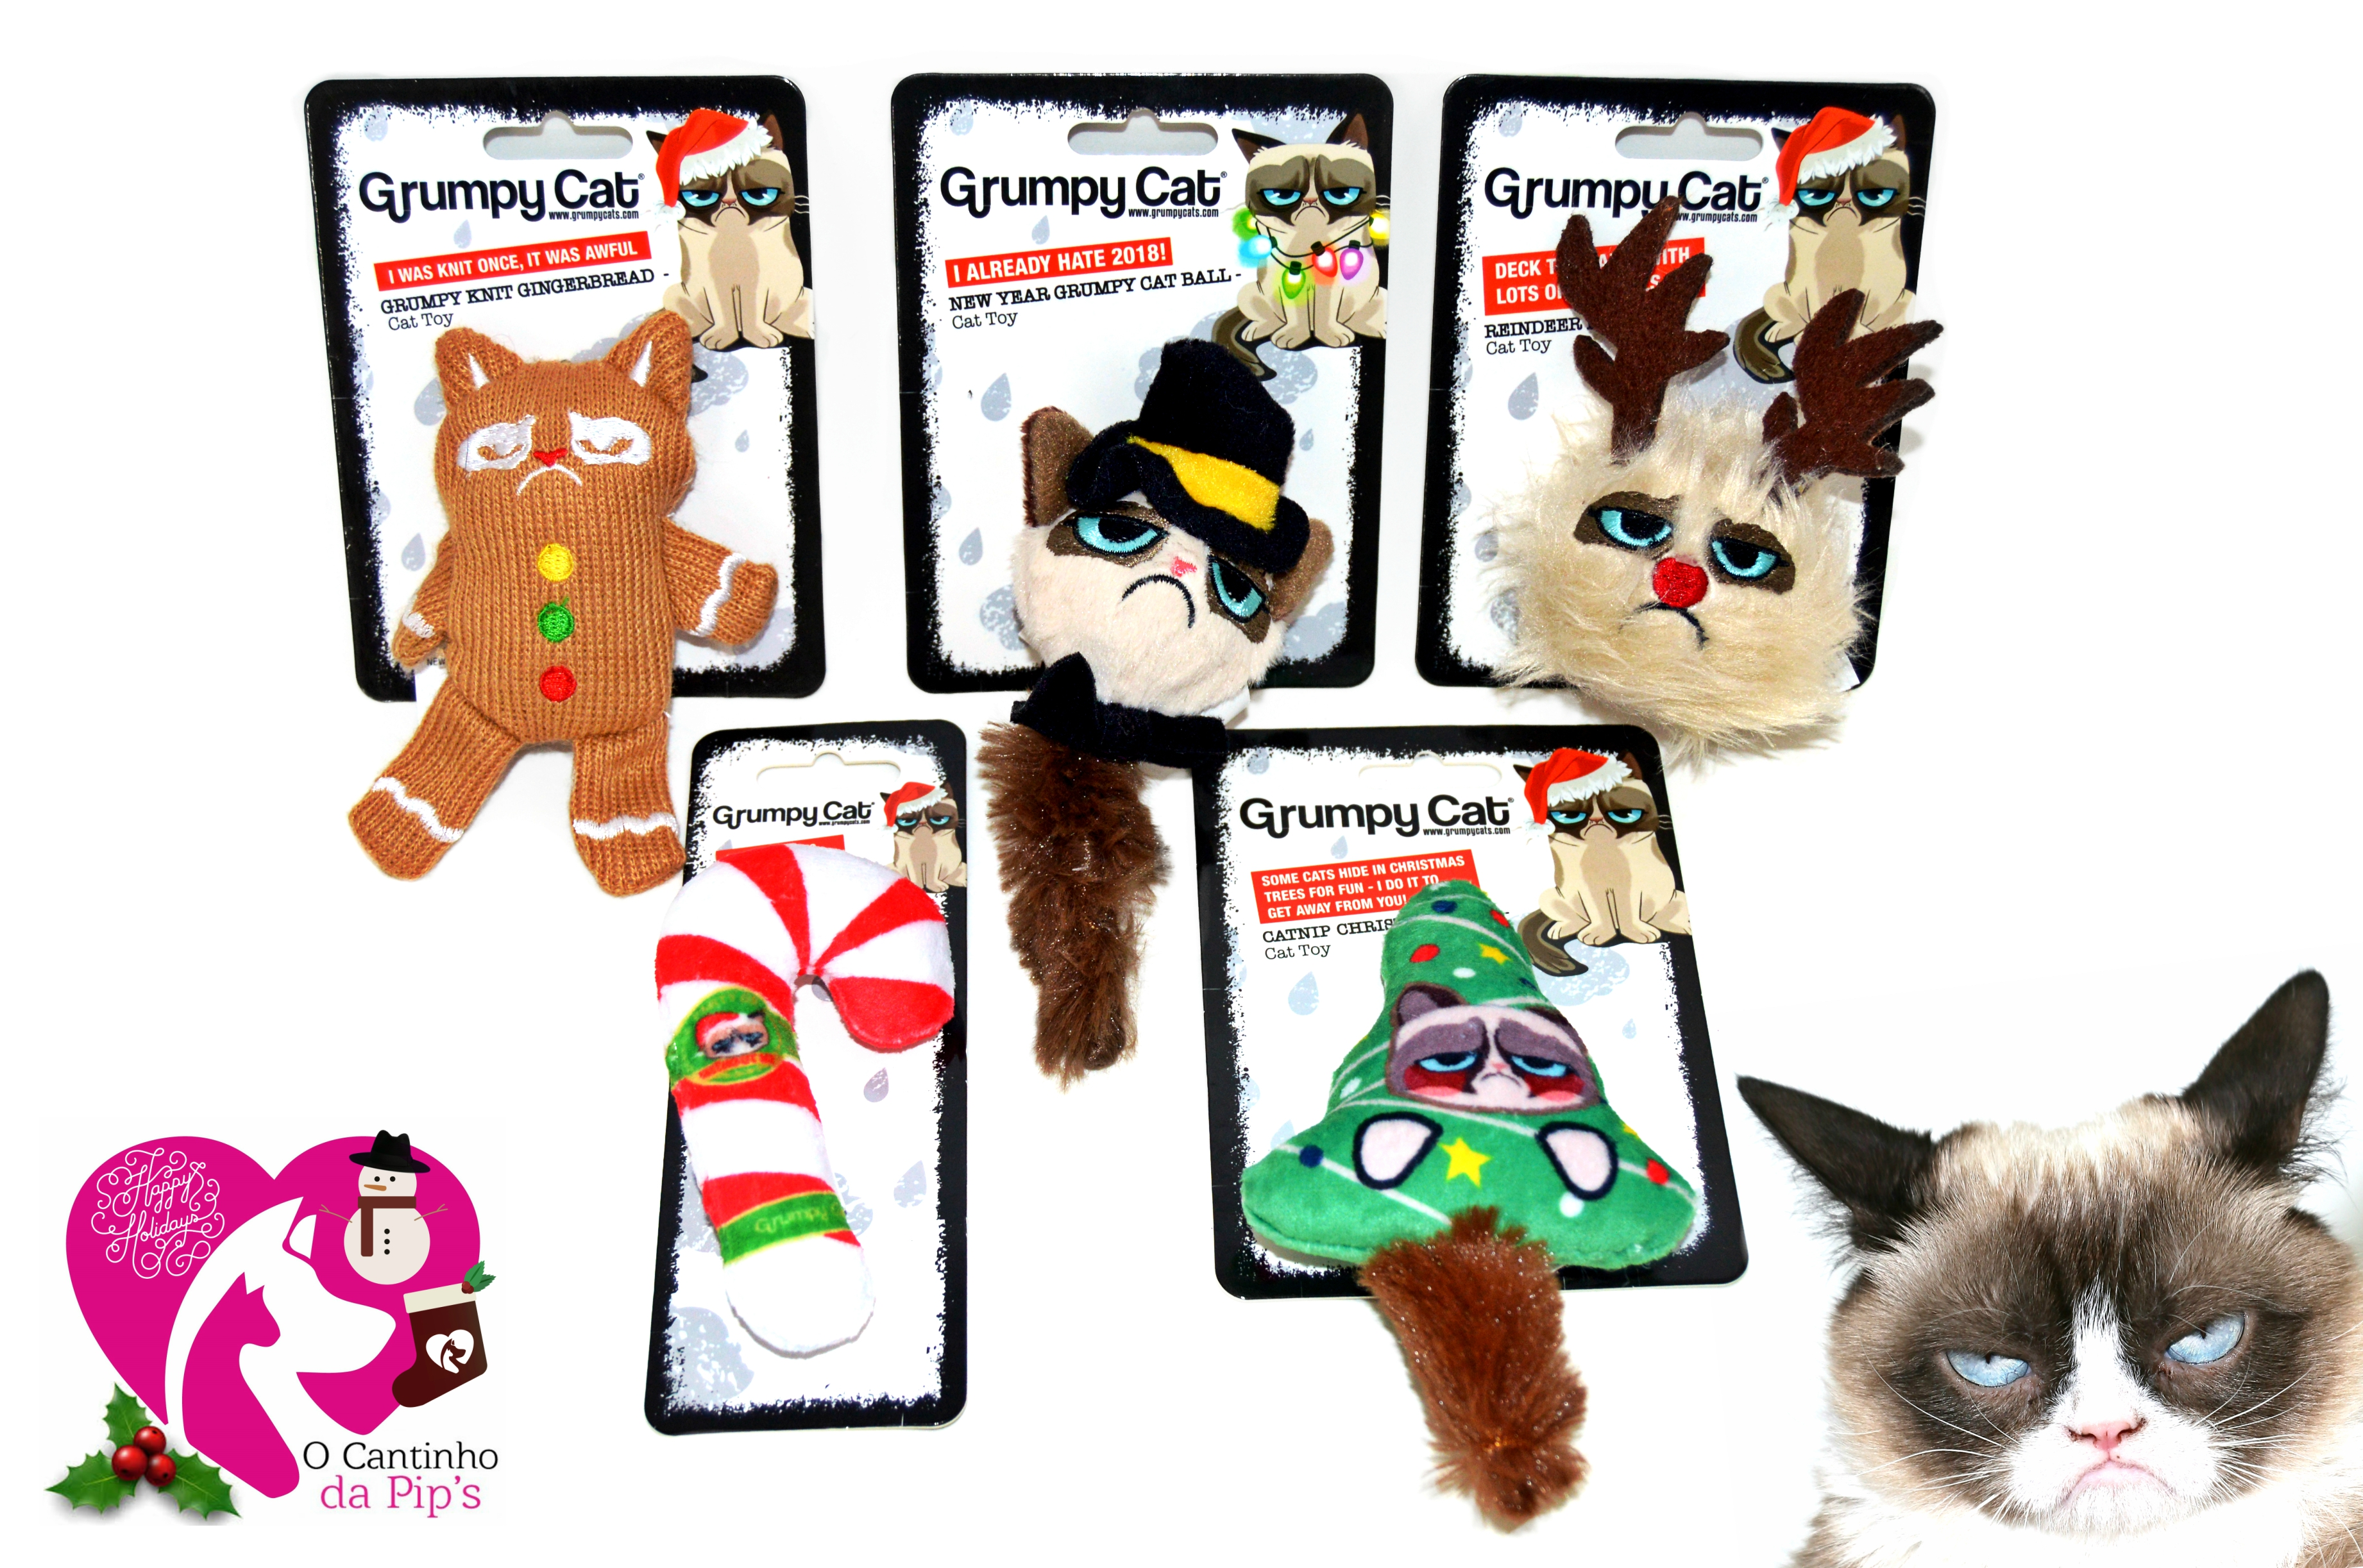 Grumpy Cat Toys